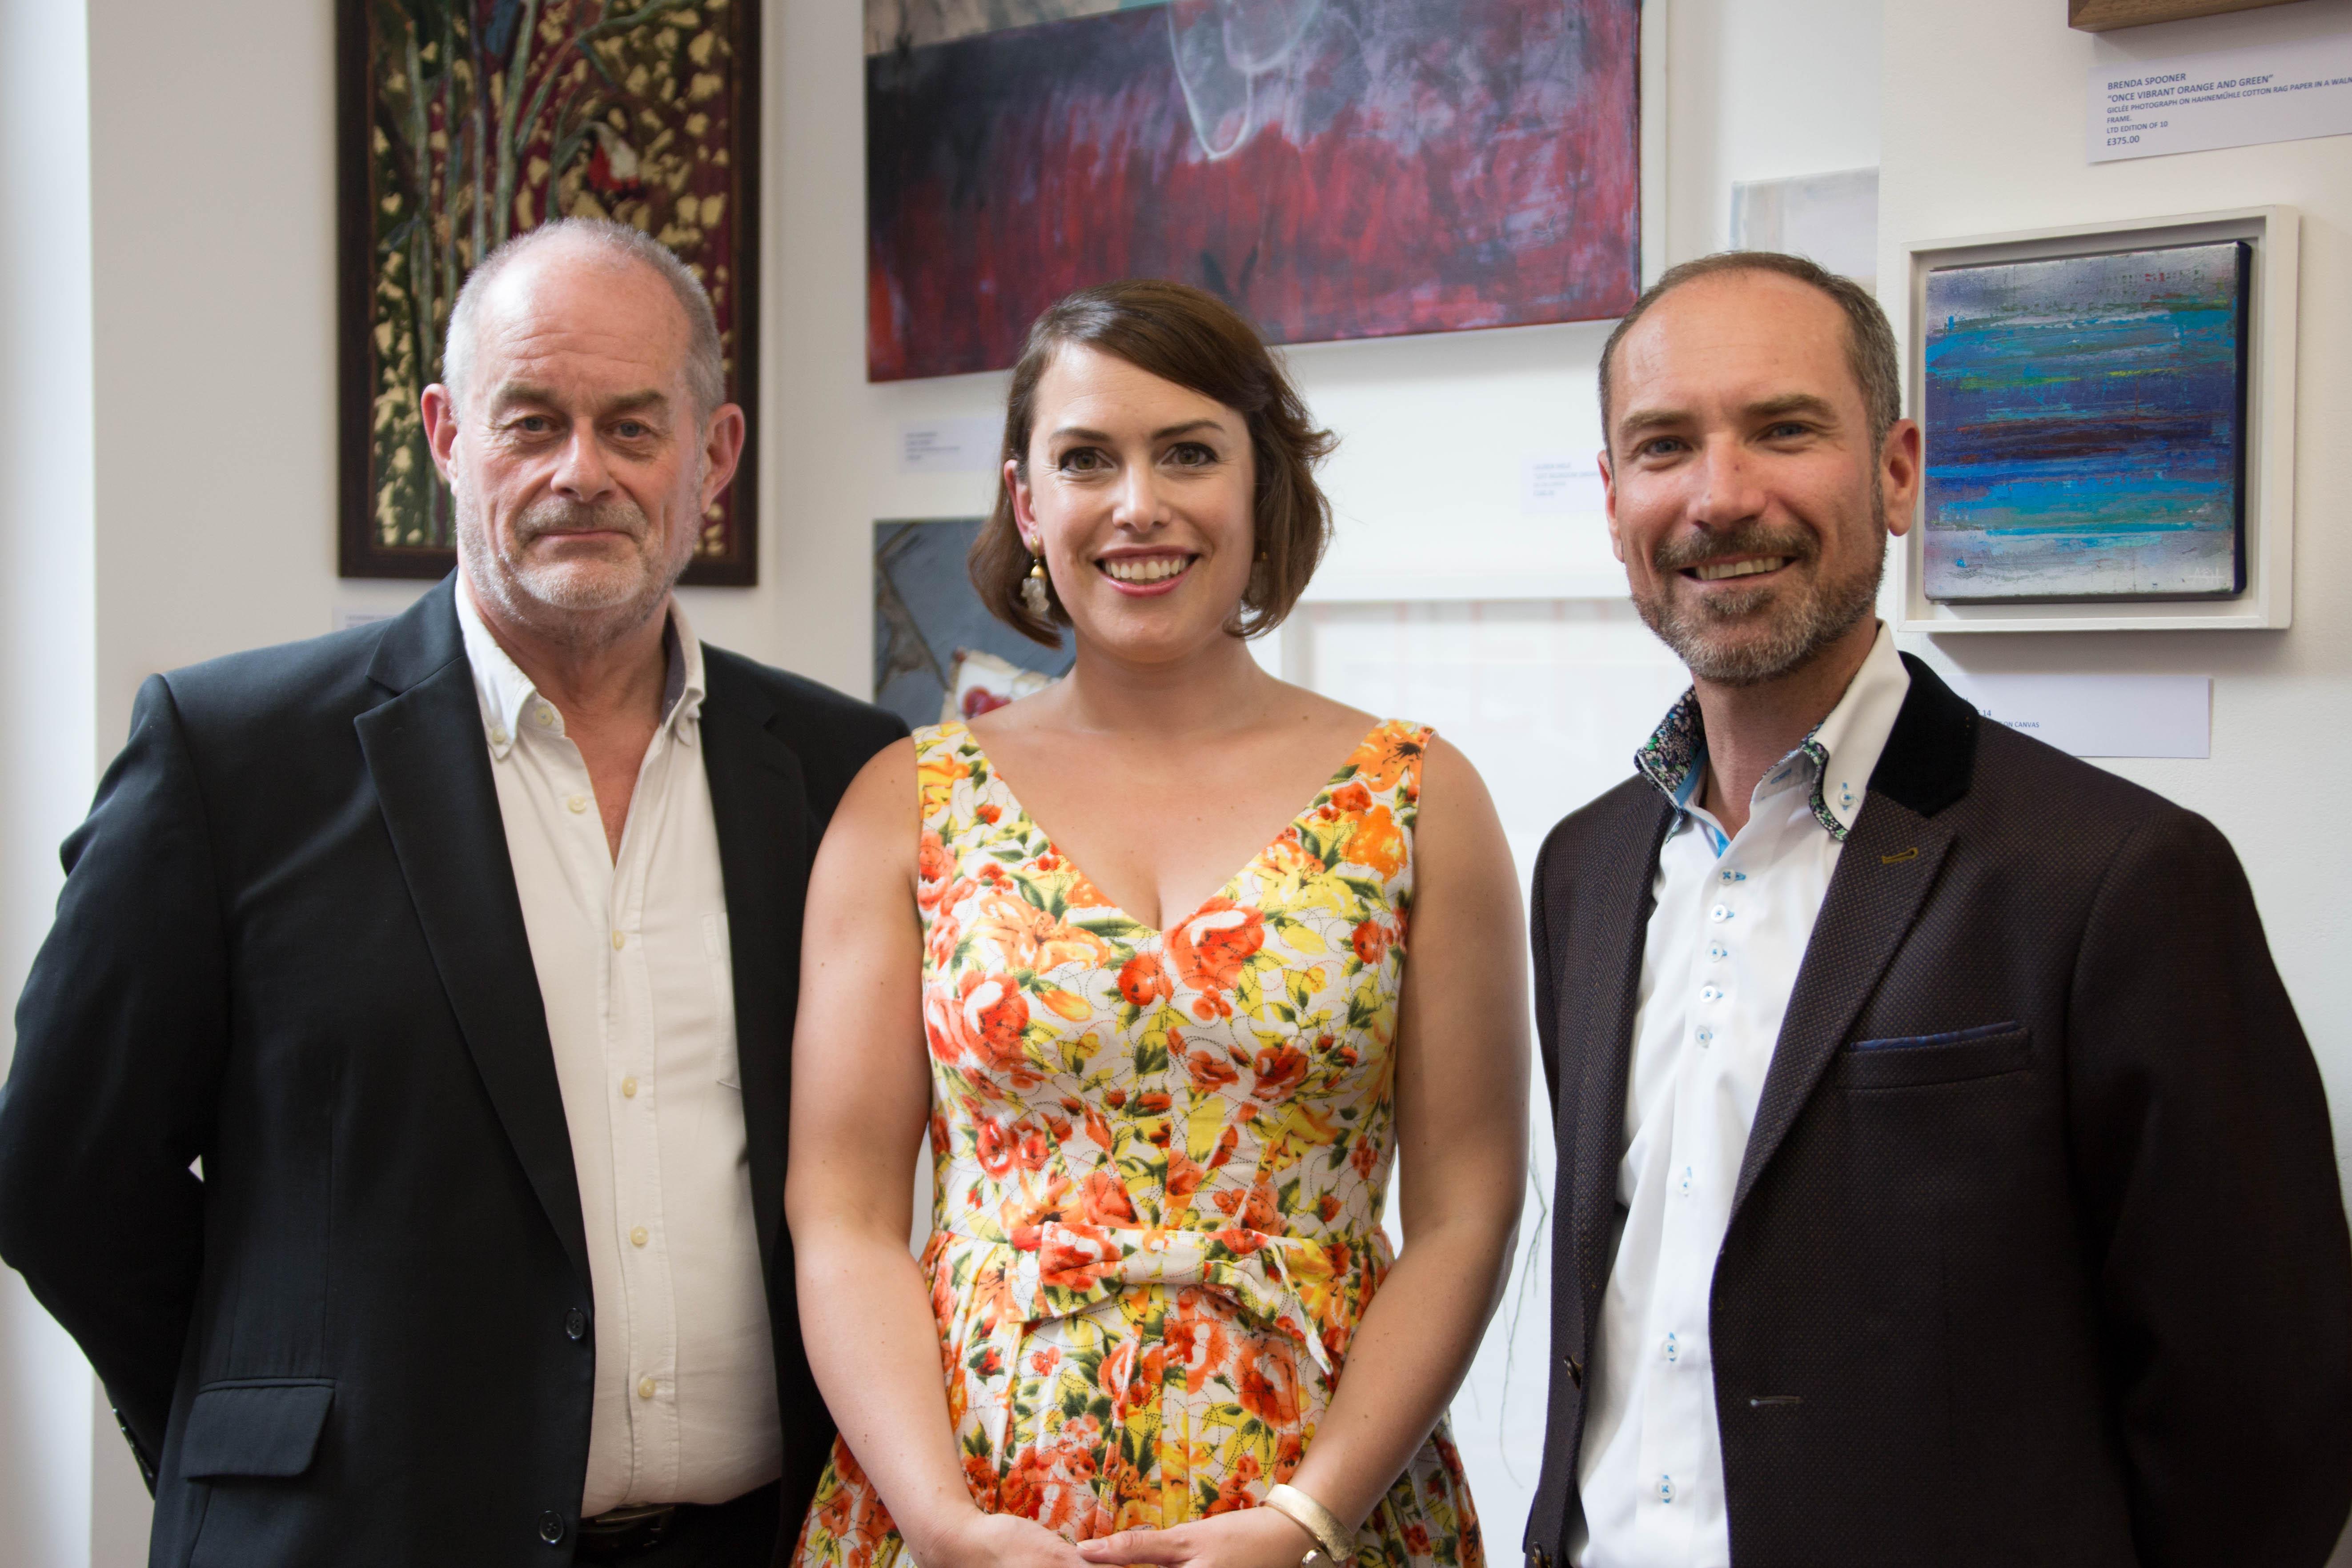 Brian Harris, Kate Enters, Stephen Crampton-Hayward announced as WITP Board of Trustees